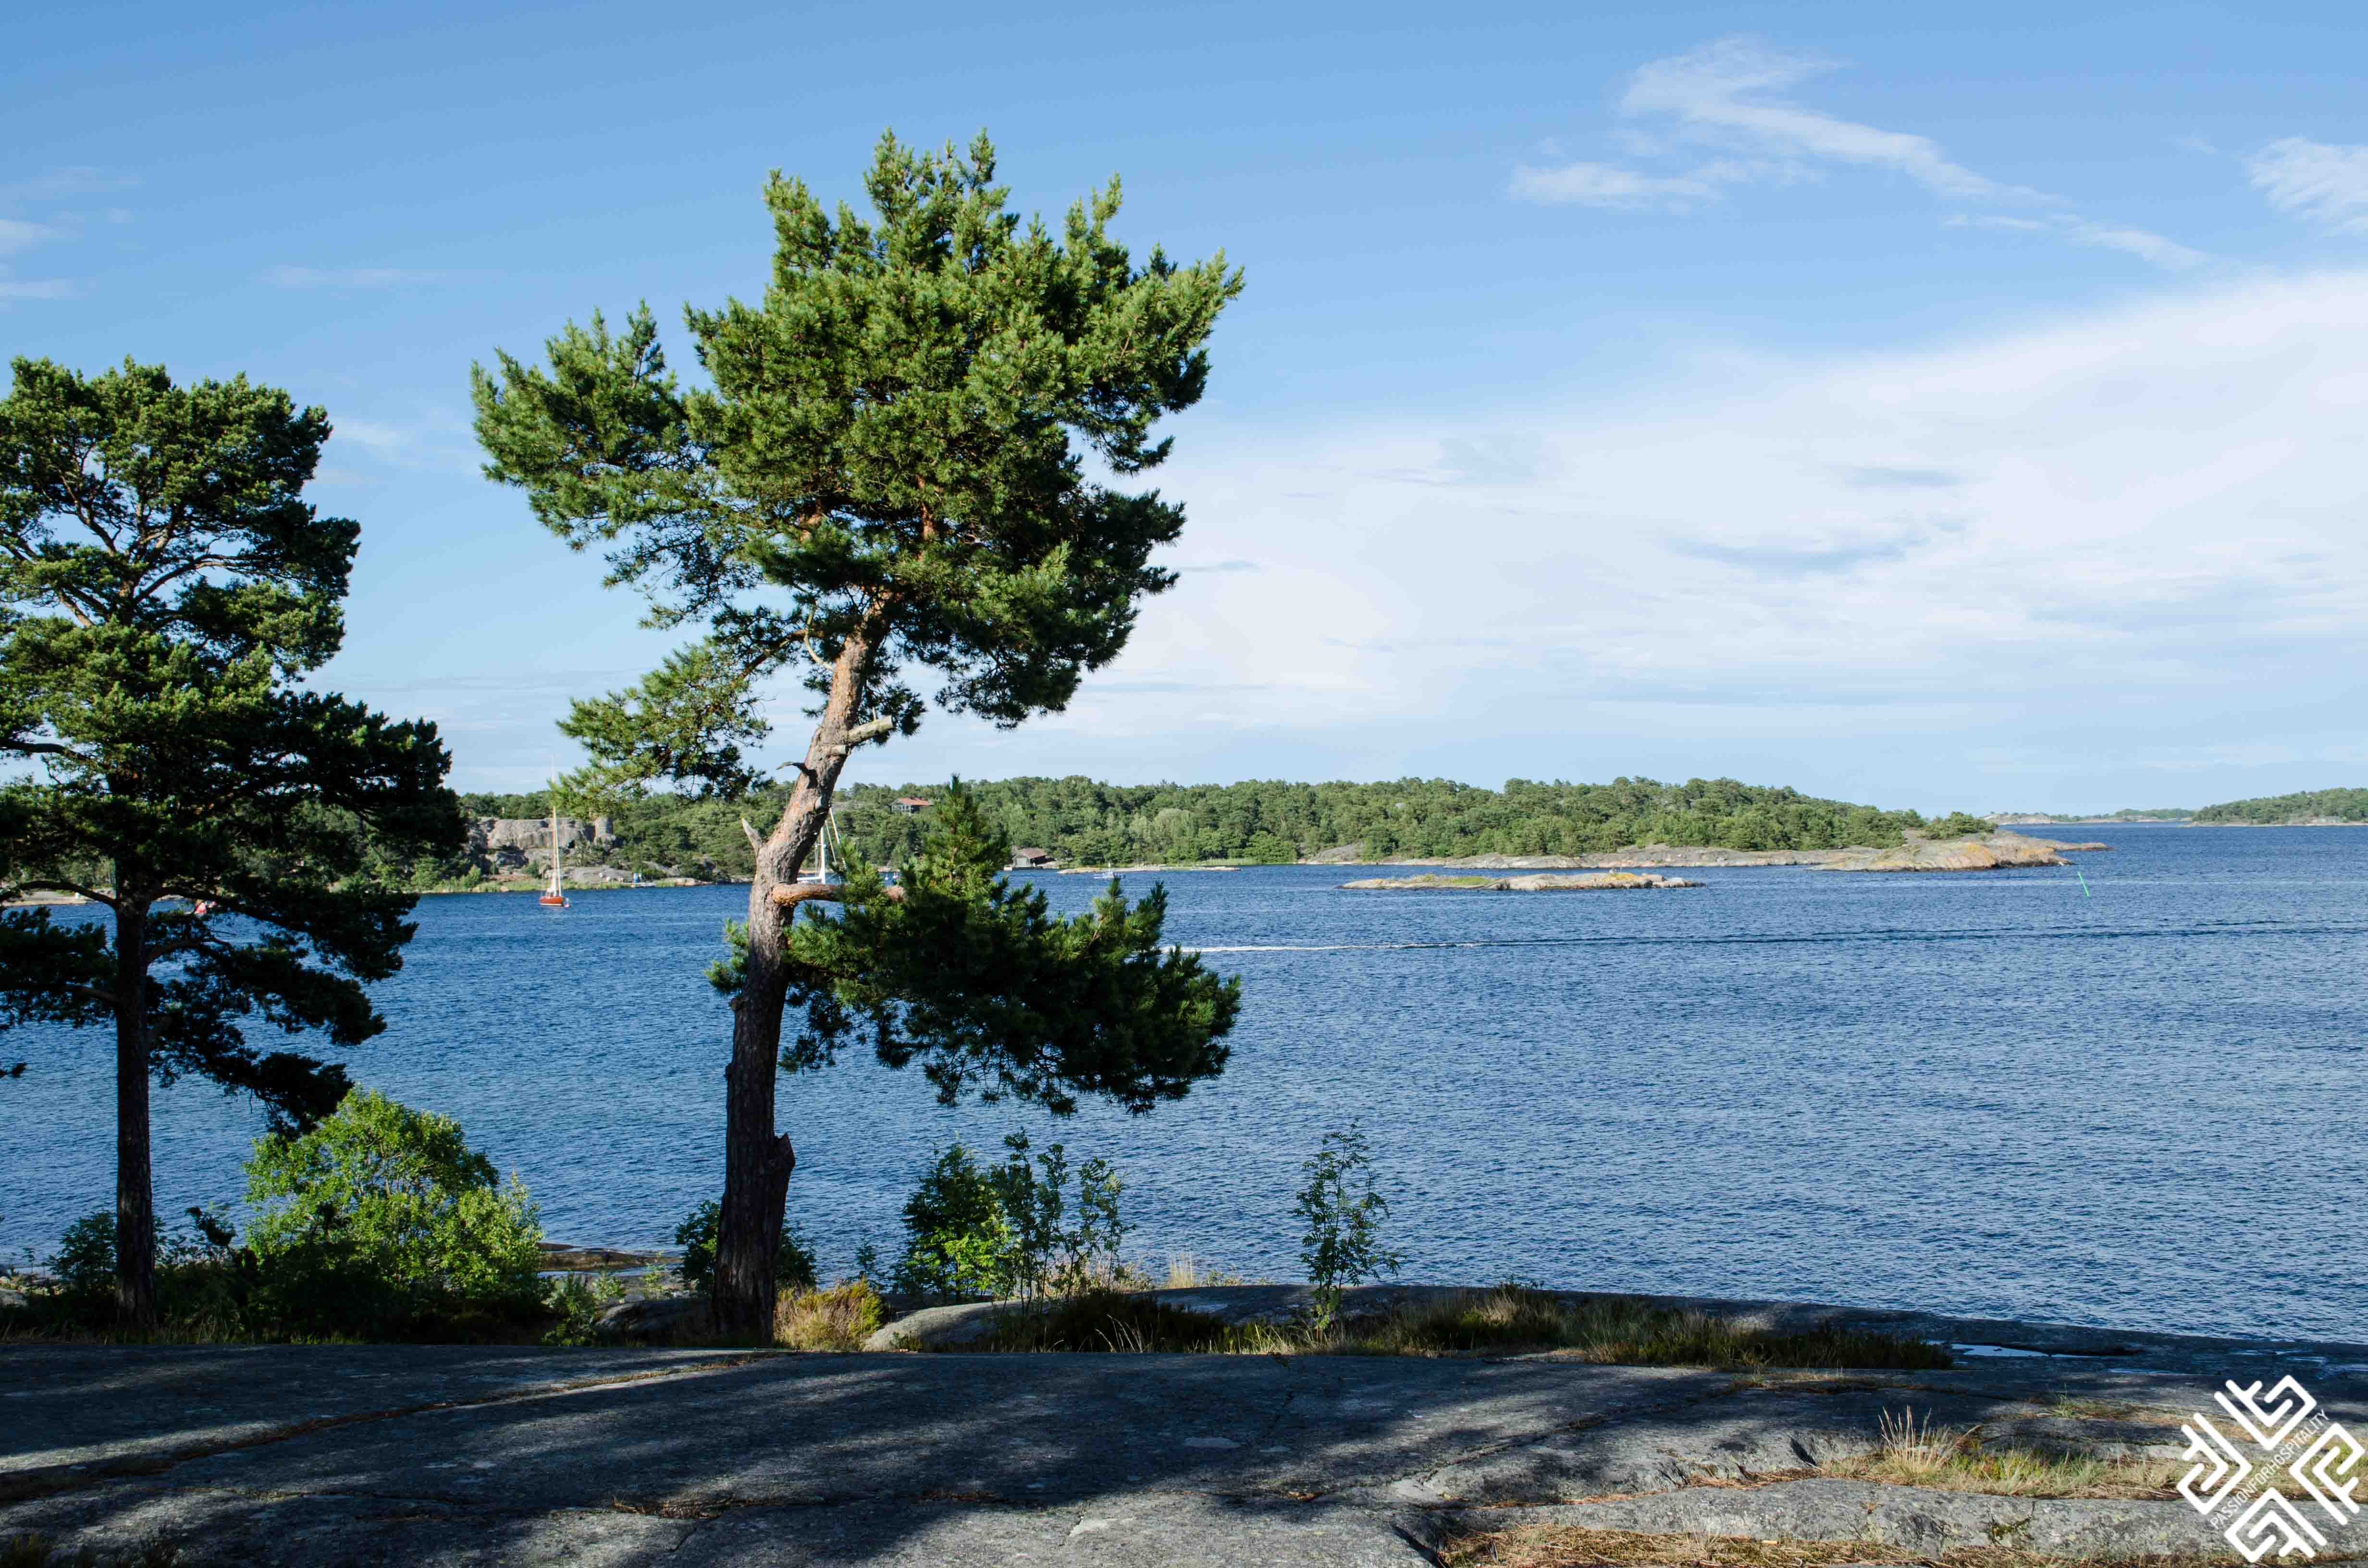 stockholm_archipelago_sandhamn-3